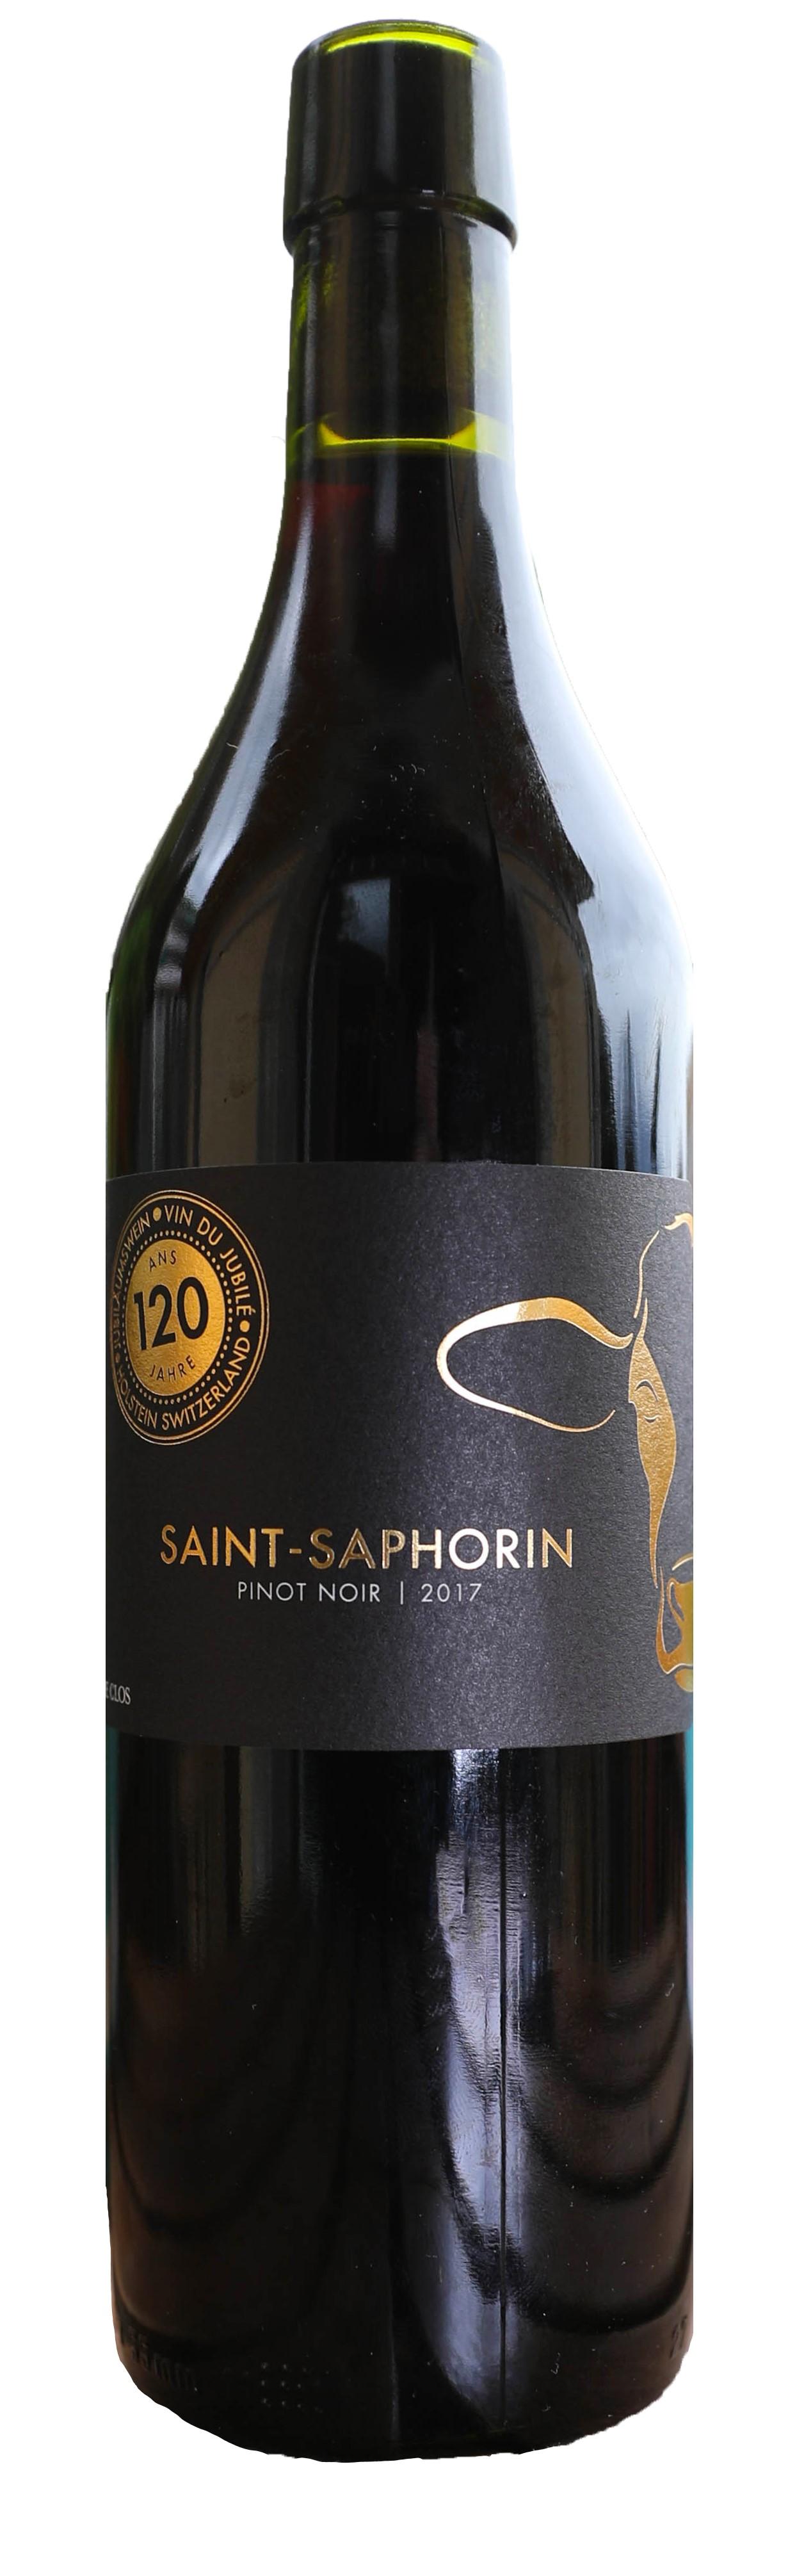 Saint-Saphorin